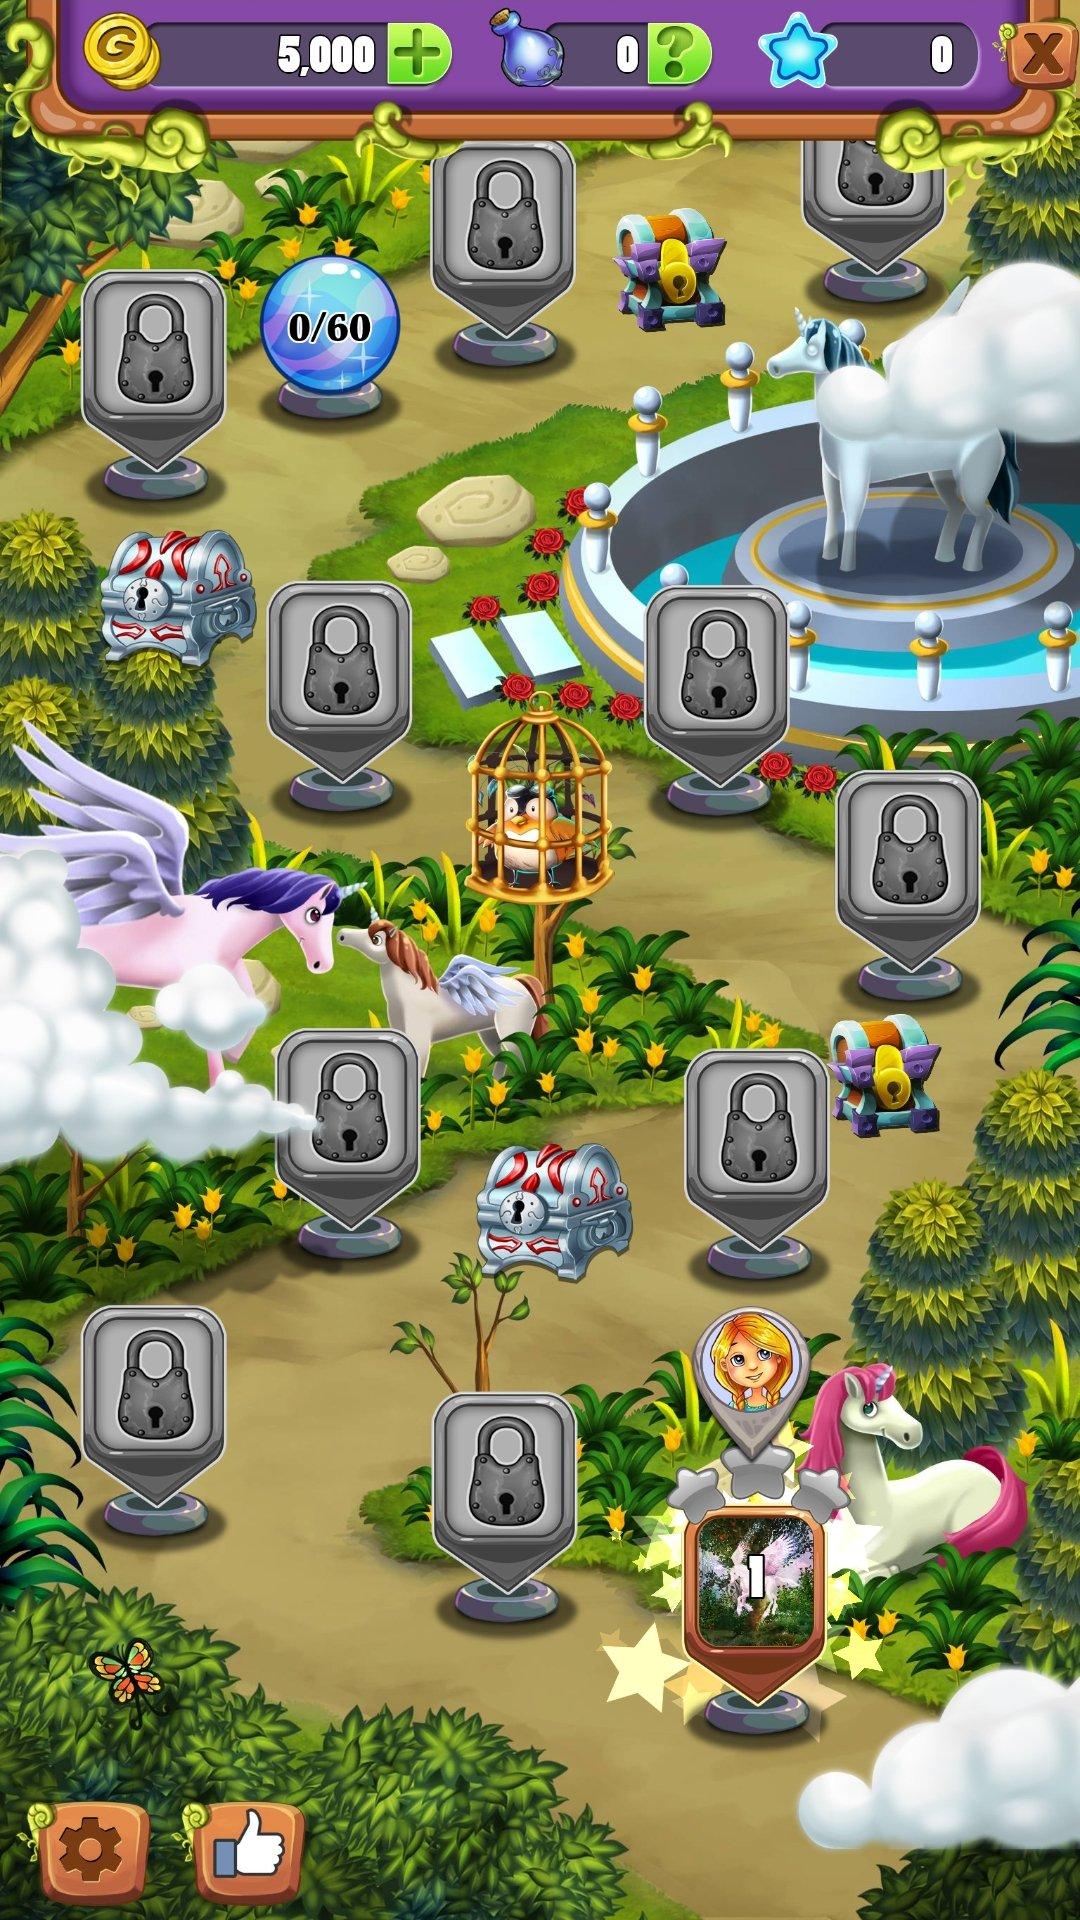 Hidden Mahjong Unicorn Garden Android image 8